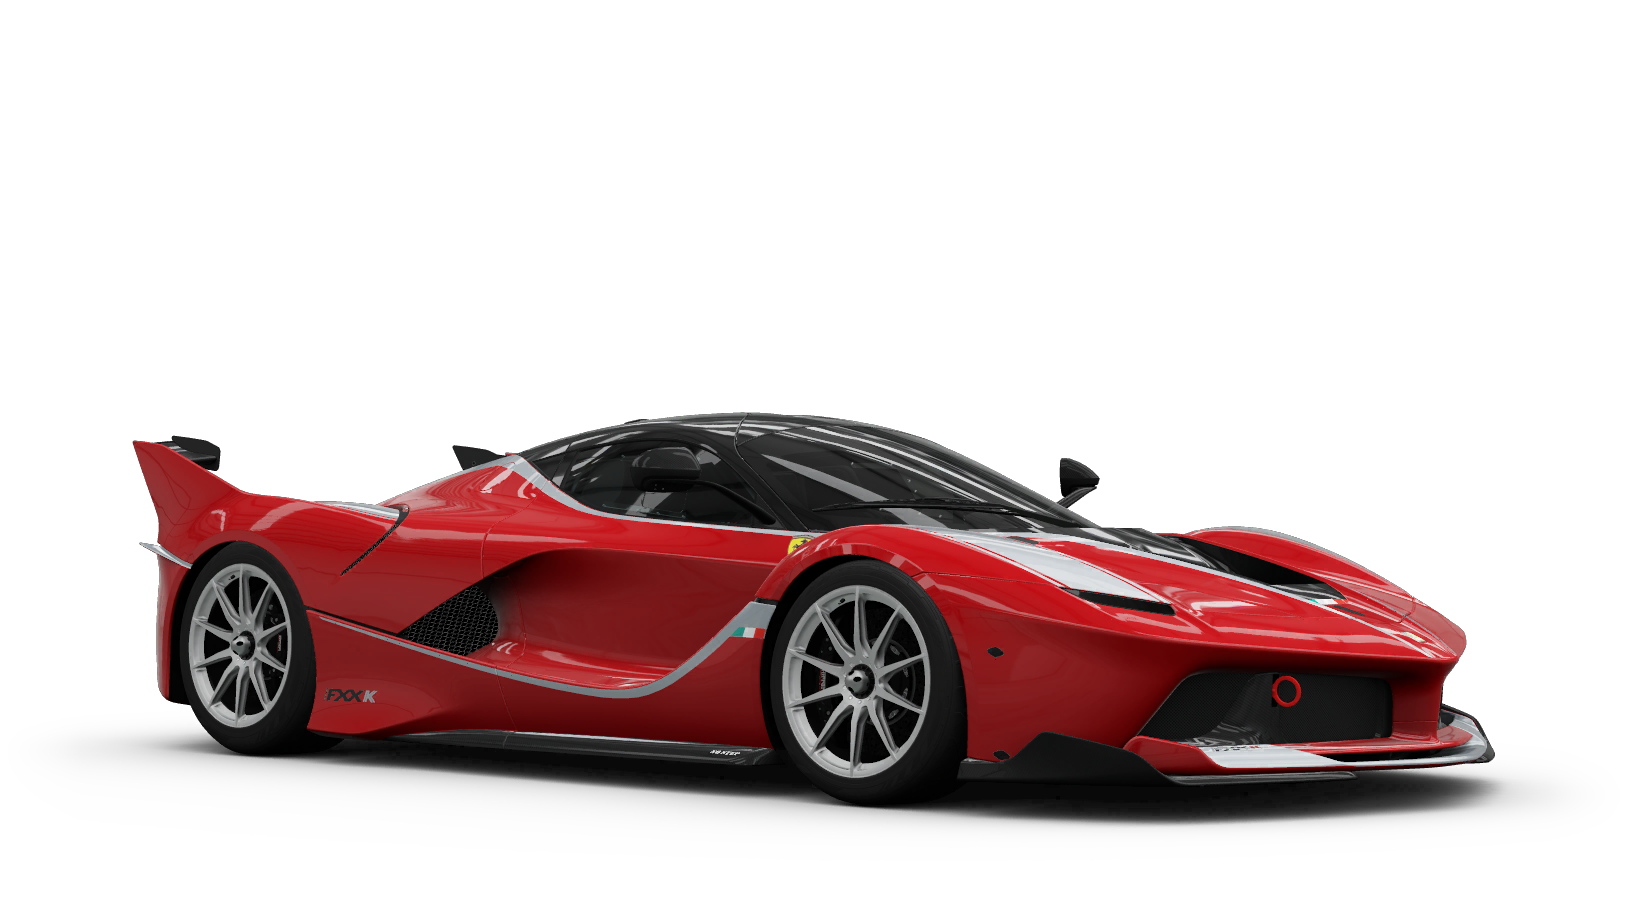 Ferrari Fxx K Forza Wiki Fandom